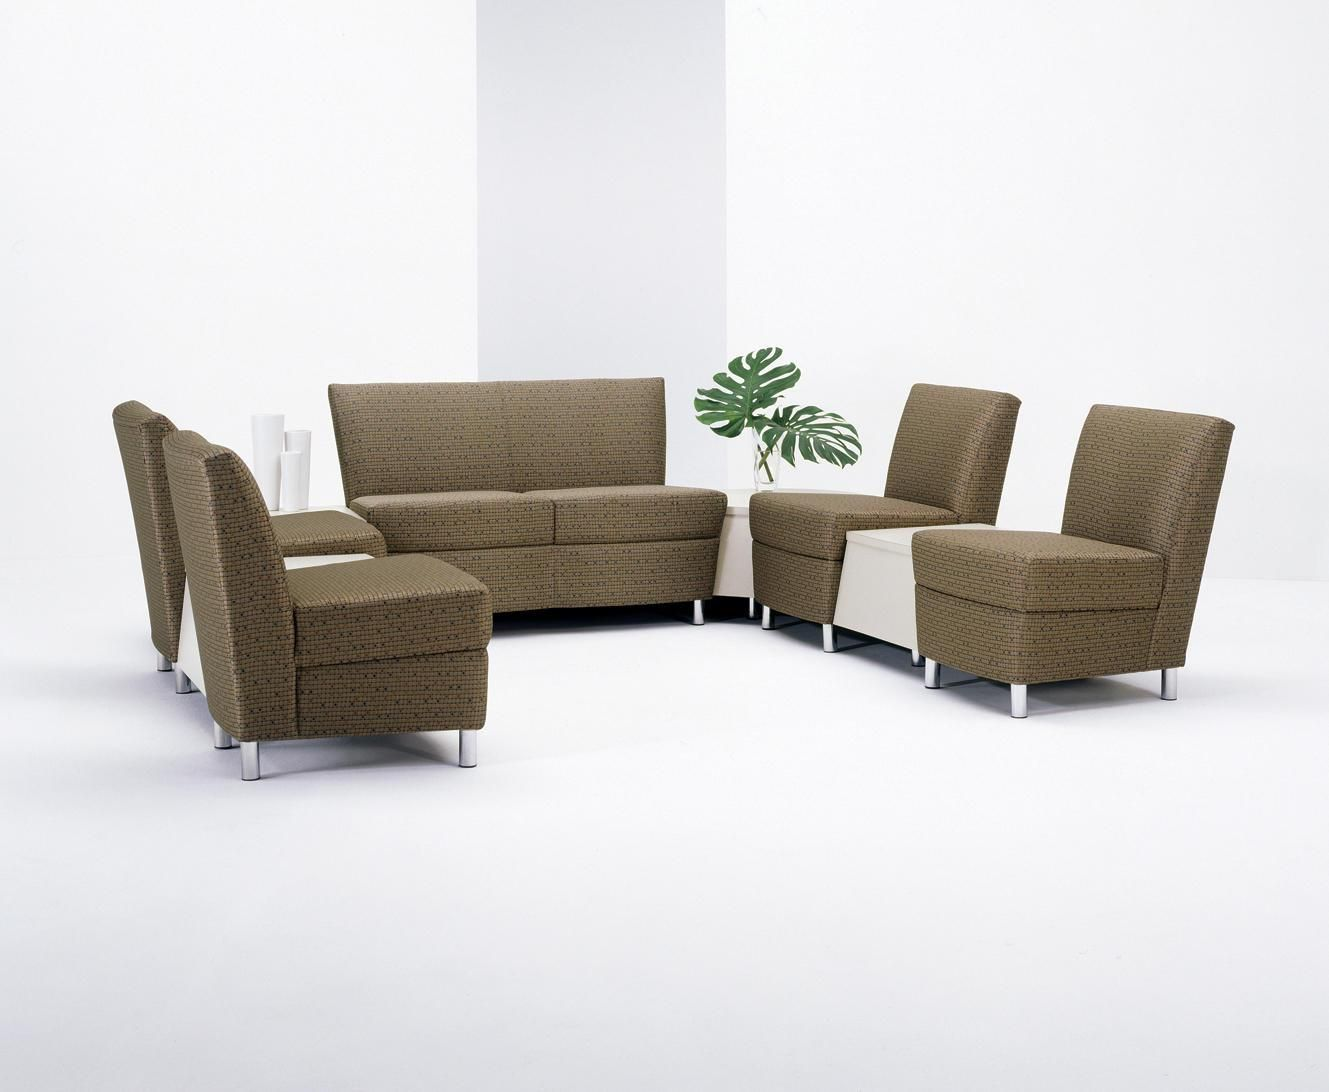 Waiting Room Sofas Hpfi 7403 Modern 3 Seat Waiting Room